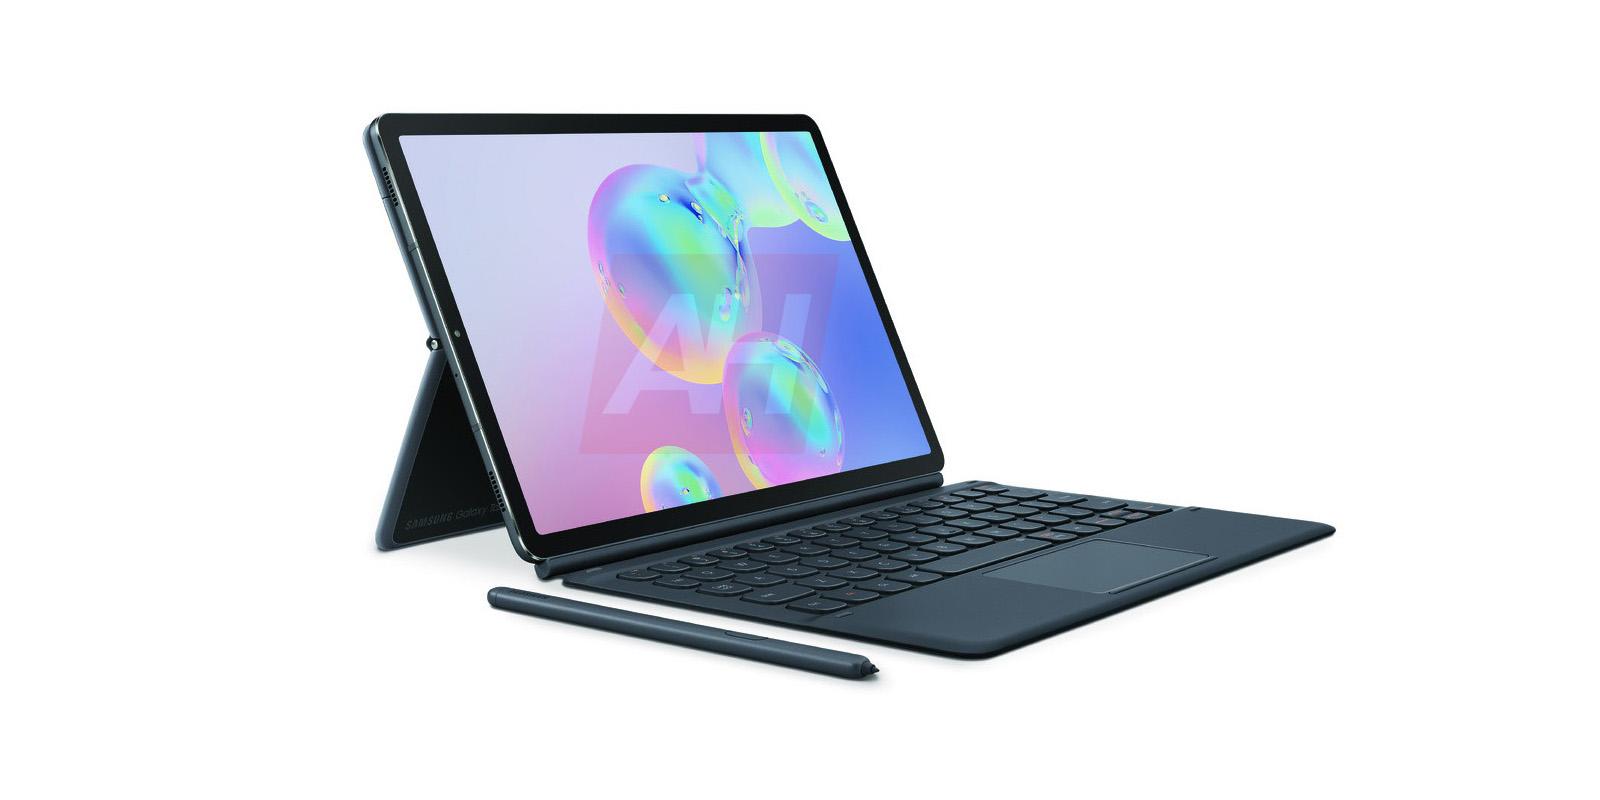 Samsung Galaxy Tab S6 renders show docking stylus, keyboard accessory